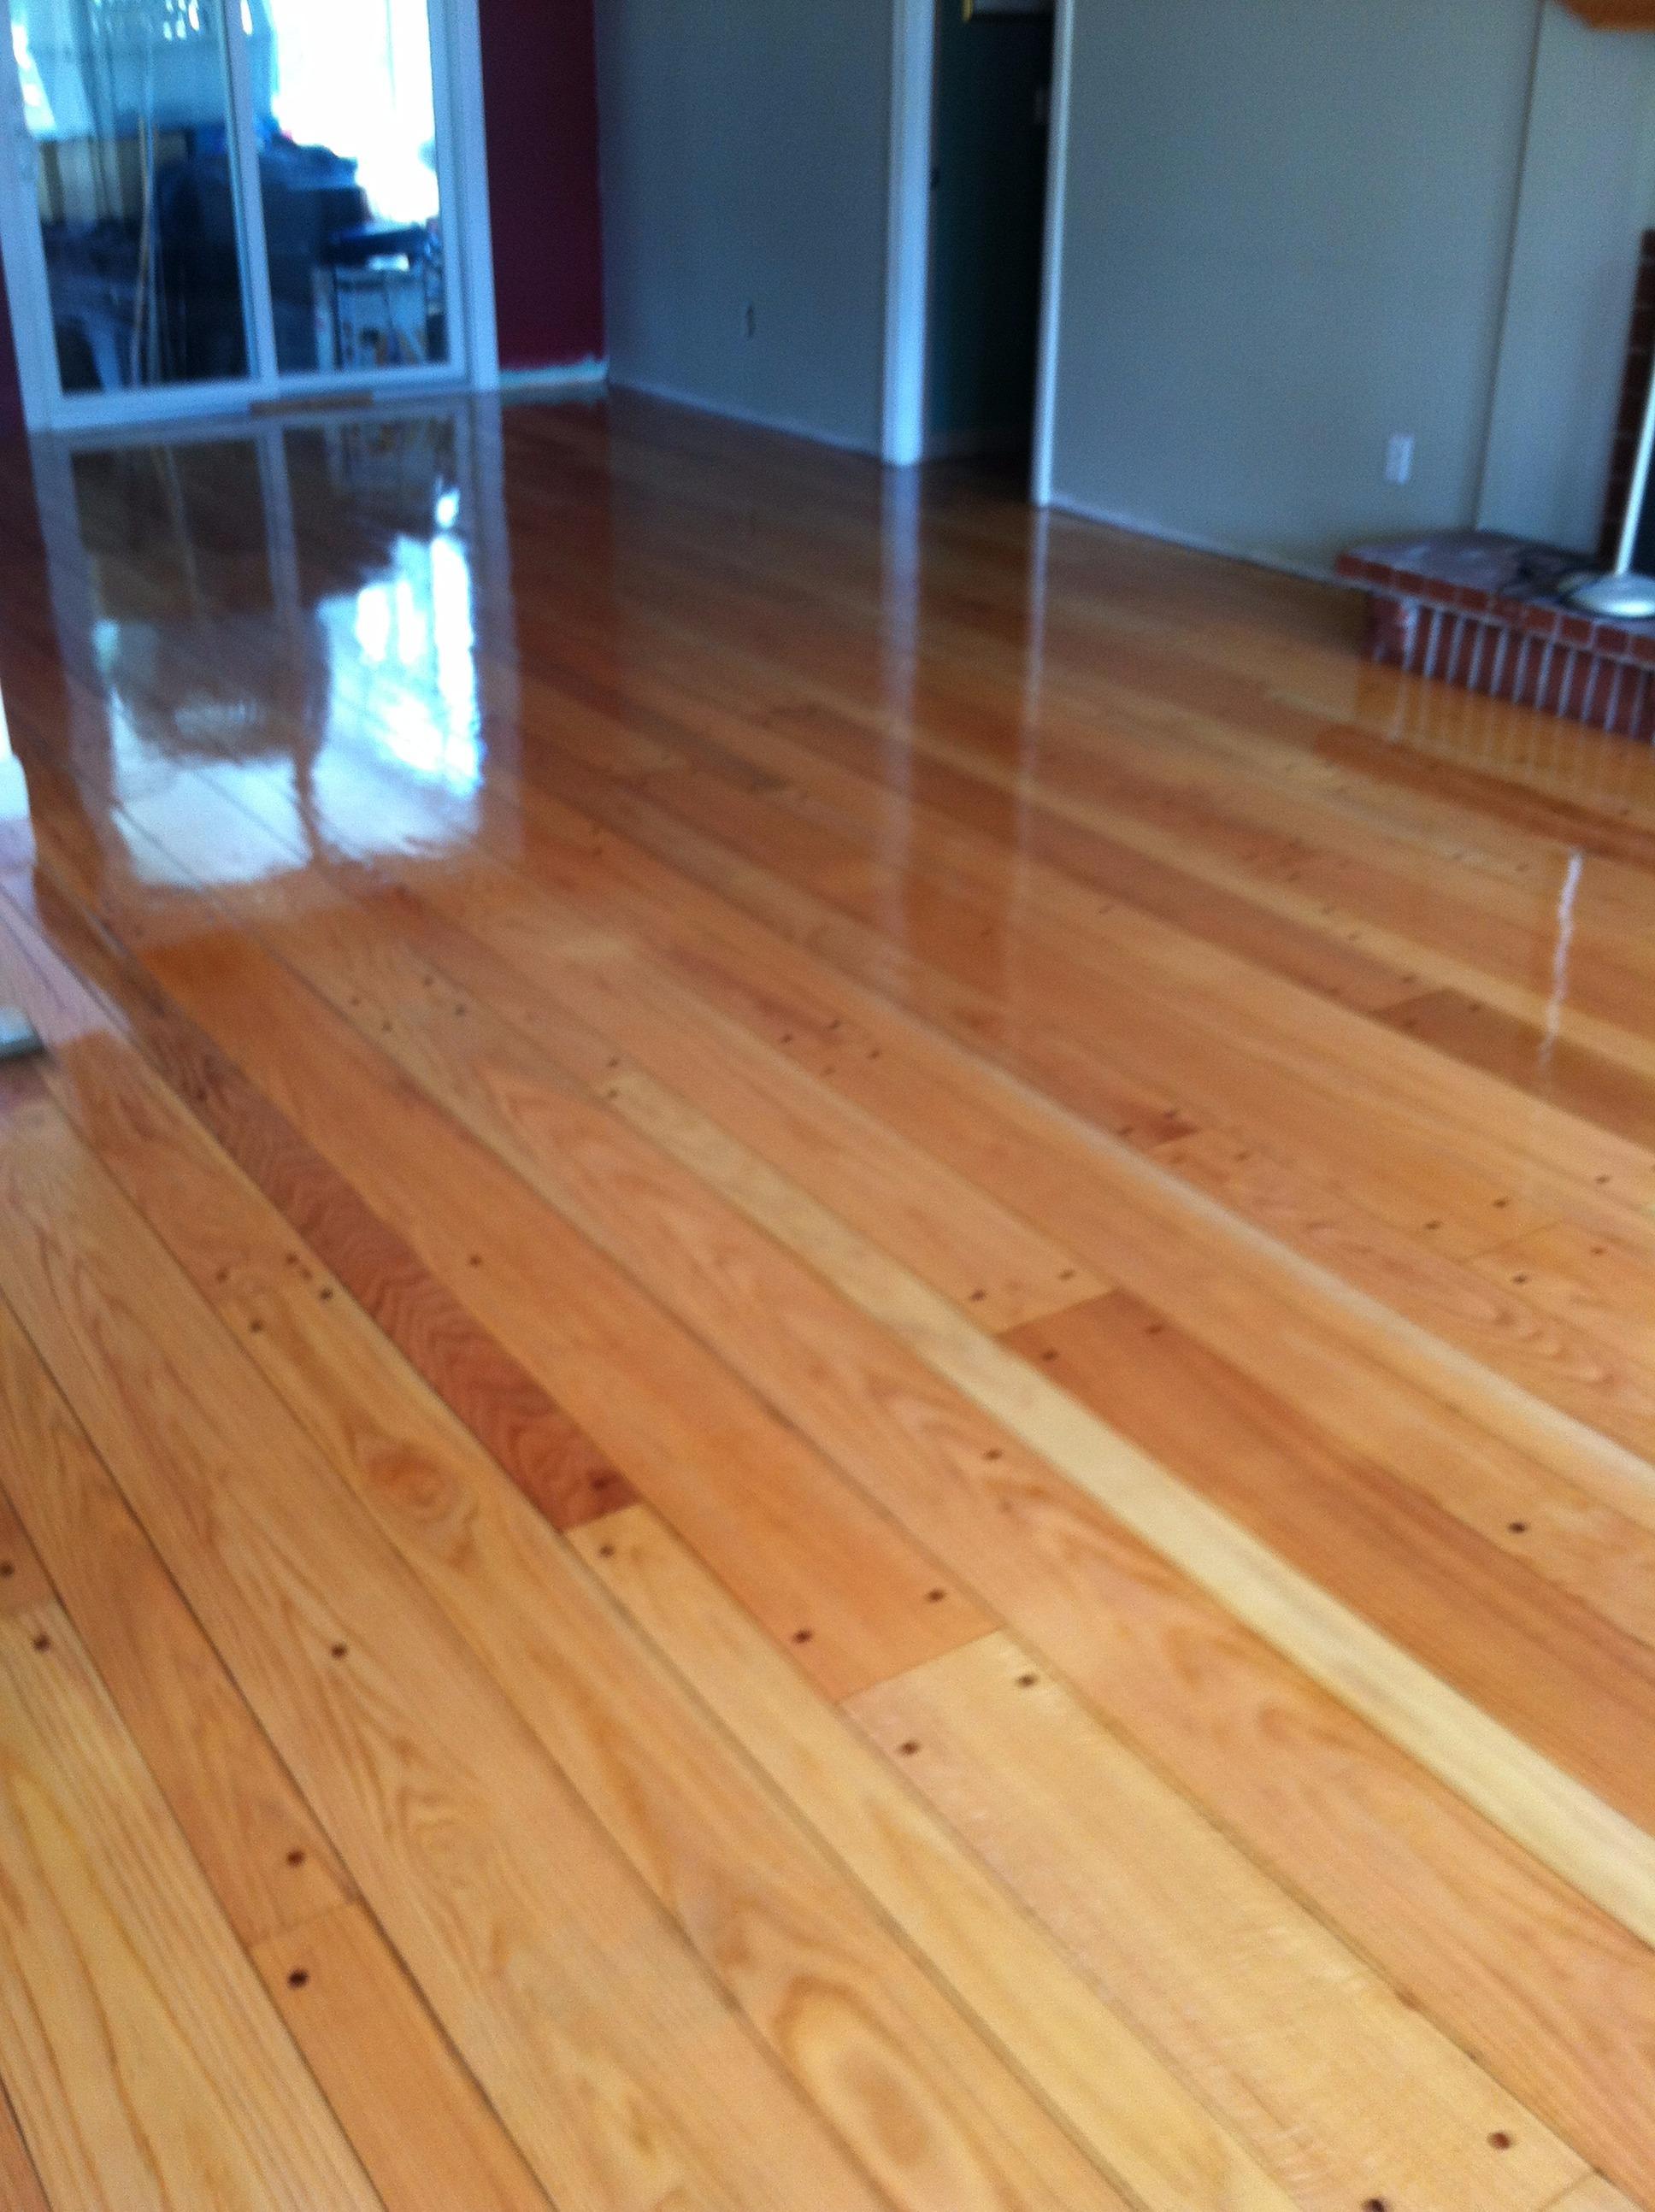 Rhode Island Floor Planing Company Inc image 5